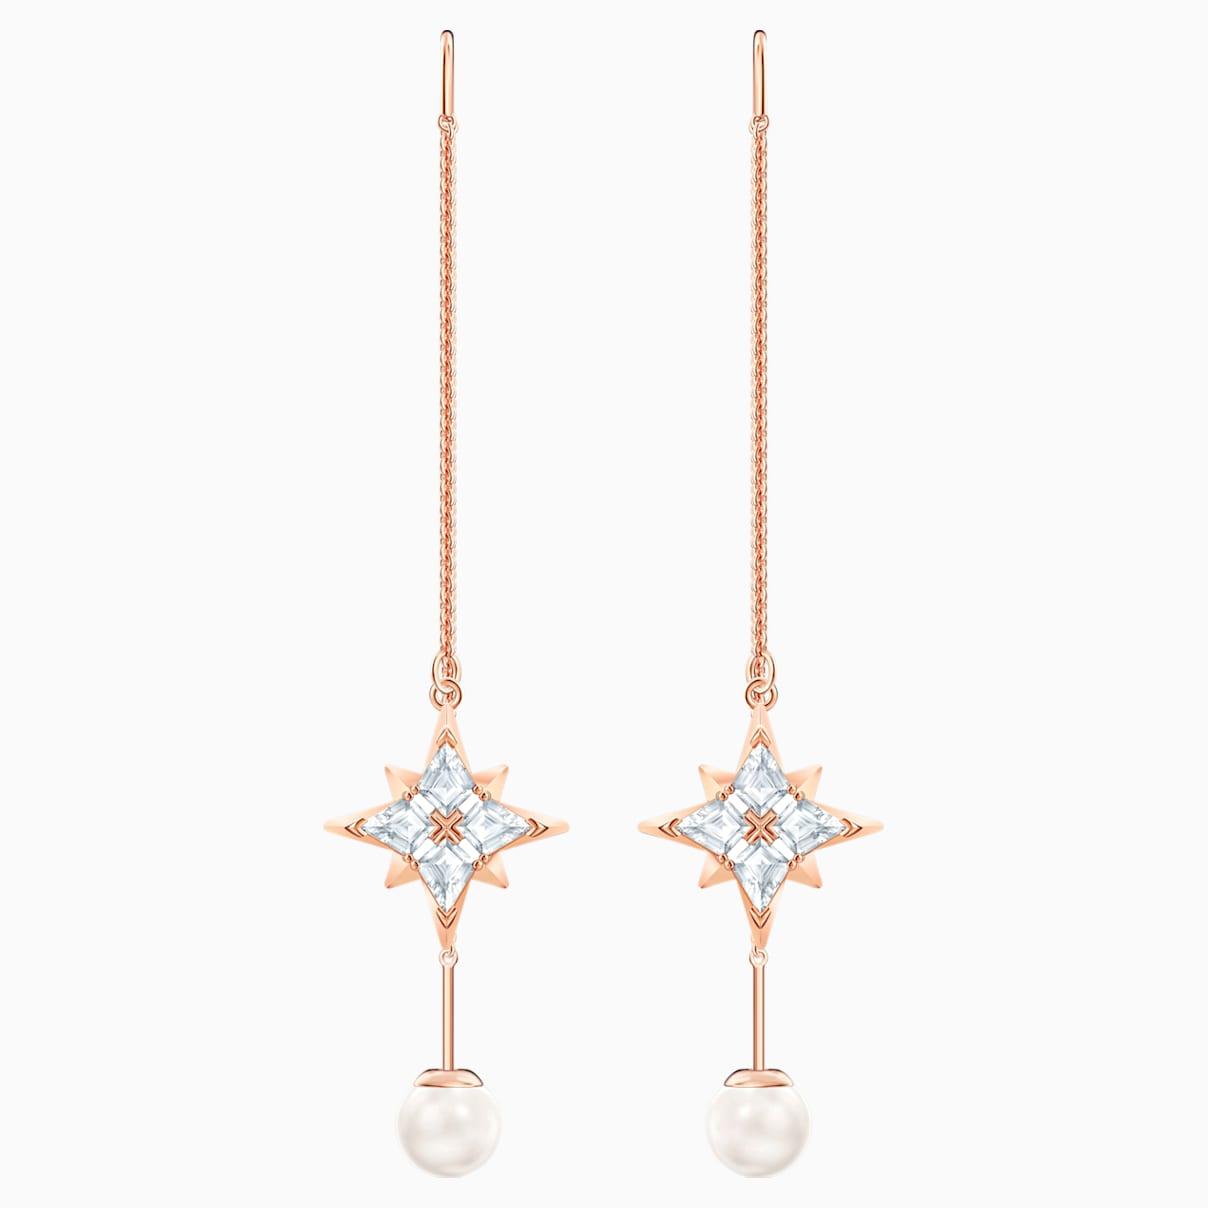 Swarovski Symbolic Chain Pierced Earrings, White, Rose-gold tone plated